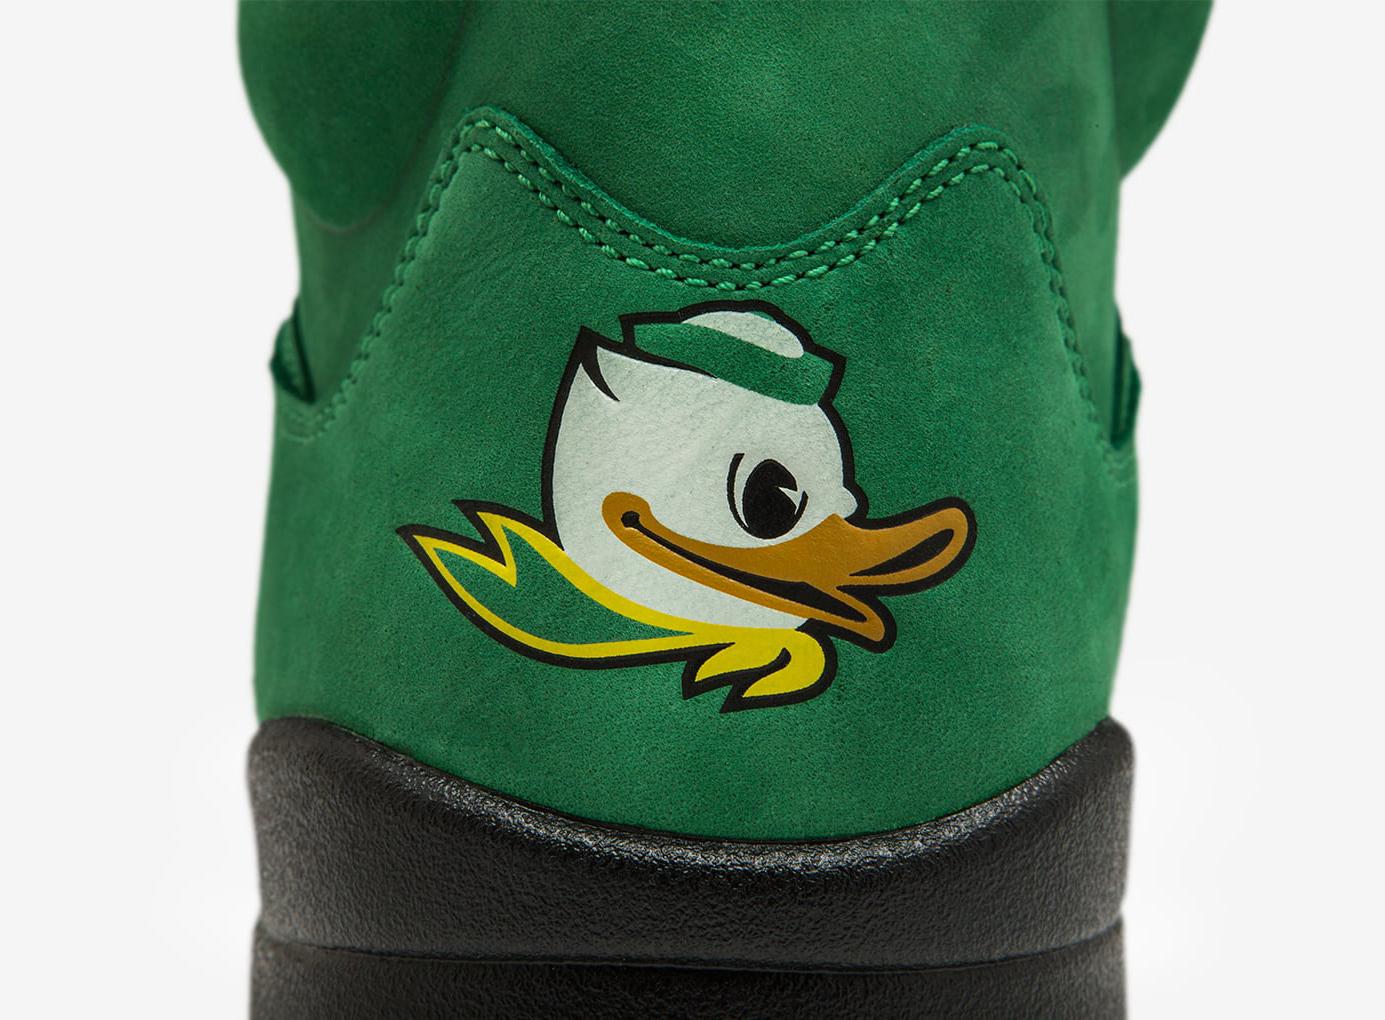 Oregon Ducks Air Jordan 5 Heel